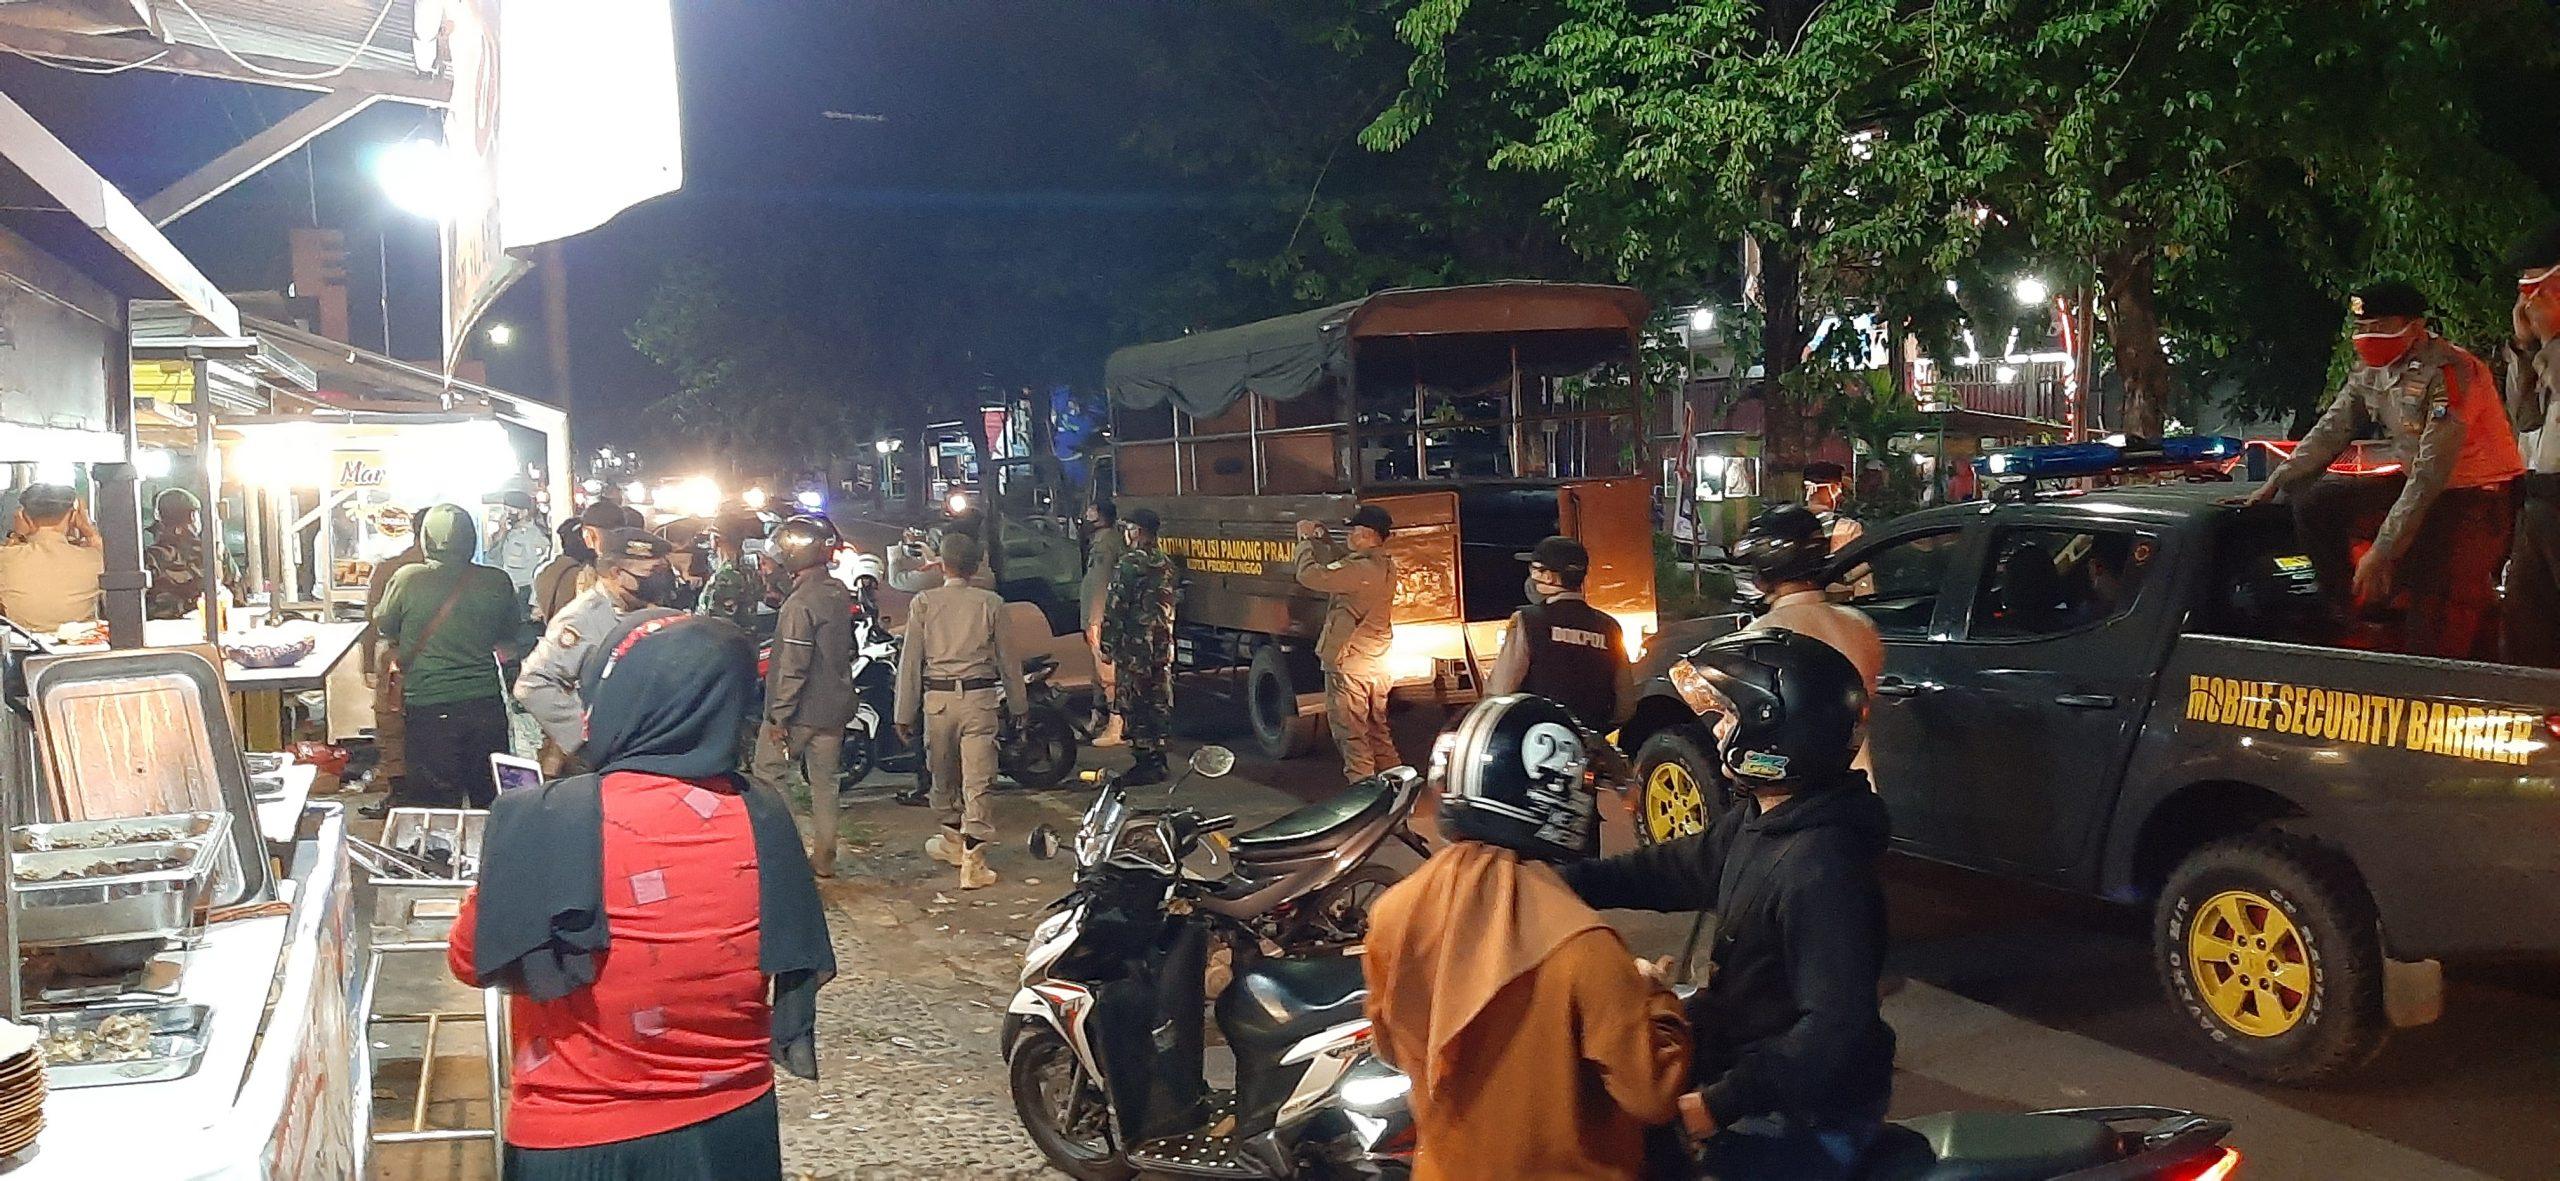 Ratusan Petugas Gabungan Kota Probolinggo Gelar Razia Humanis Antisipasi Penyebaran Covid-19